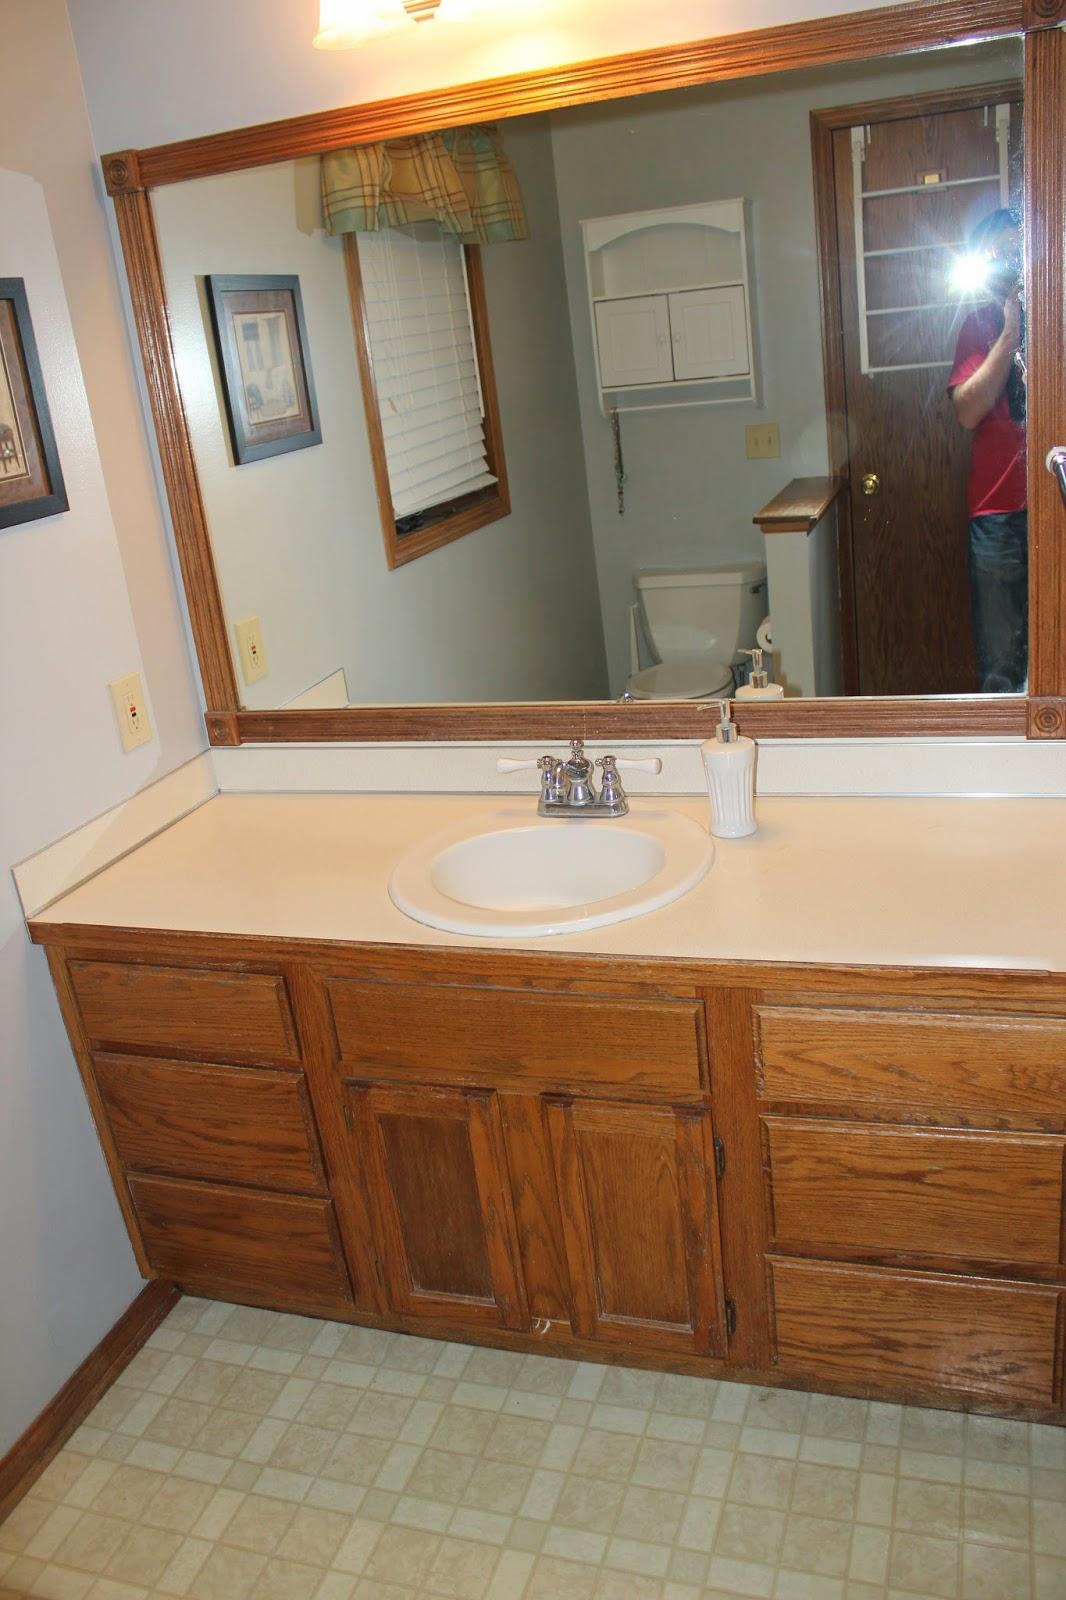 LADDitude: Our DIY Bathroom Remodel for under $300